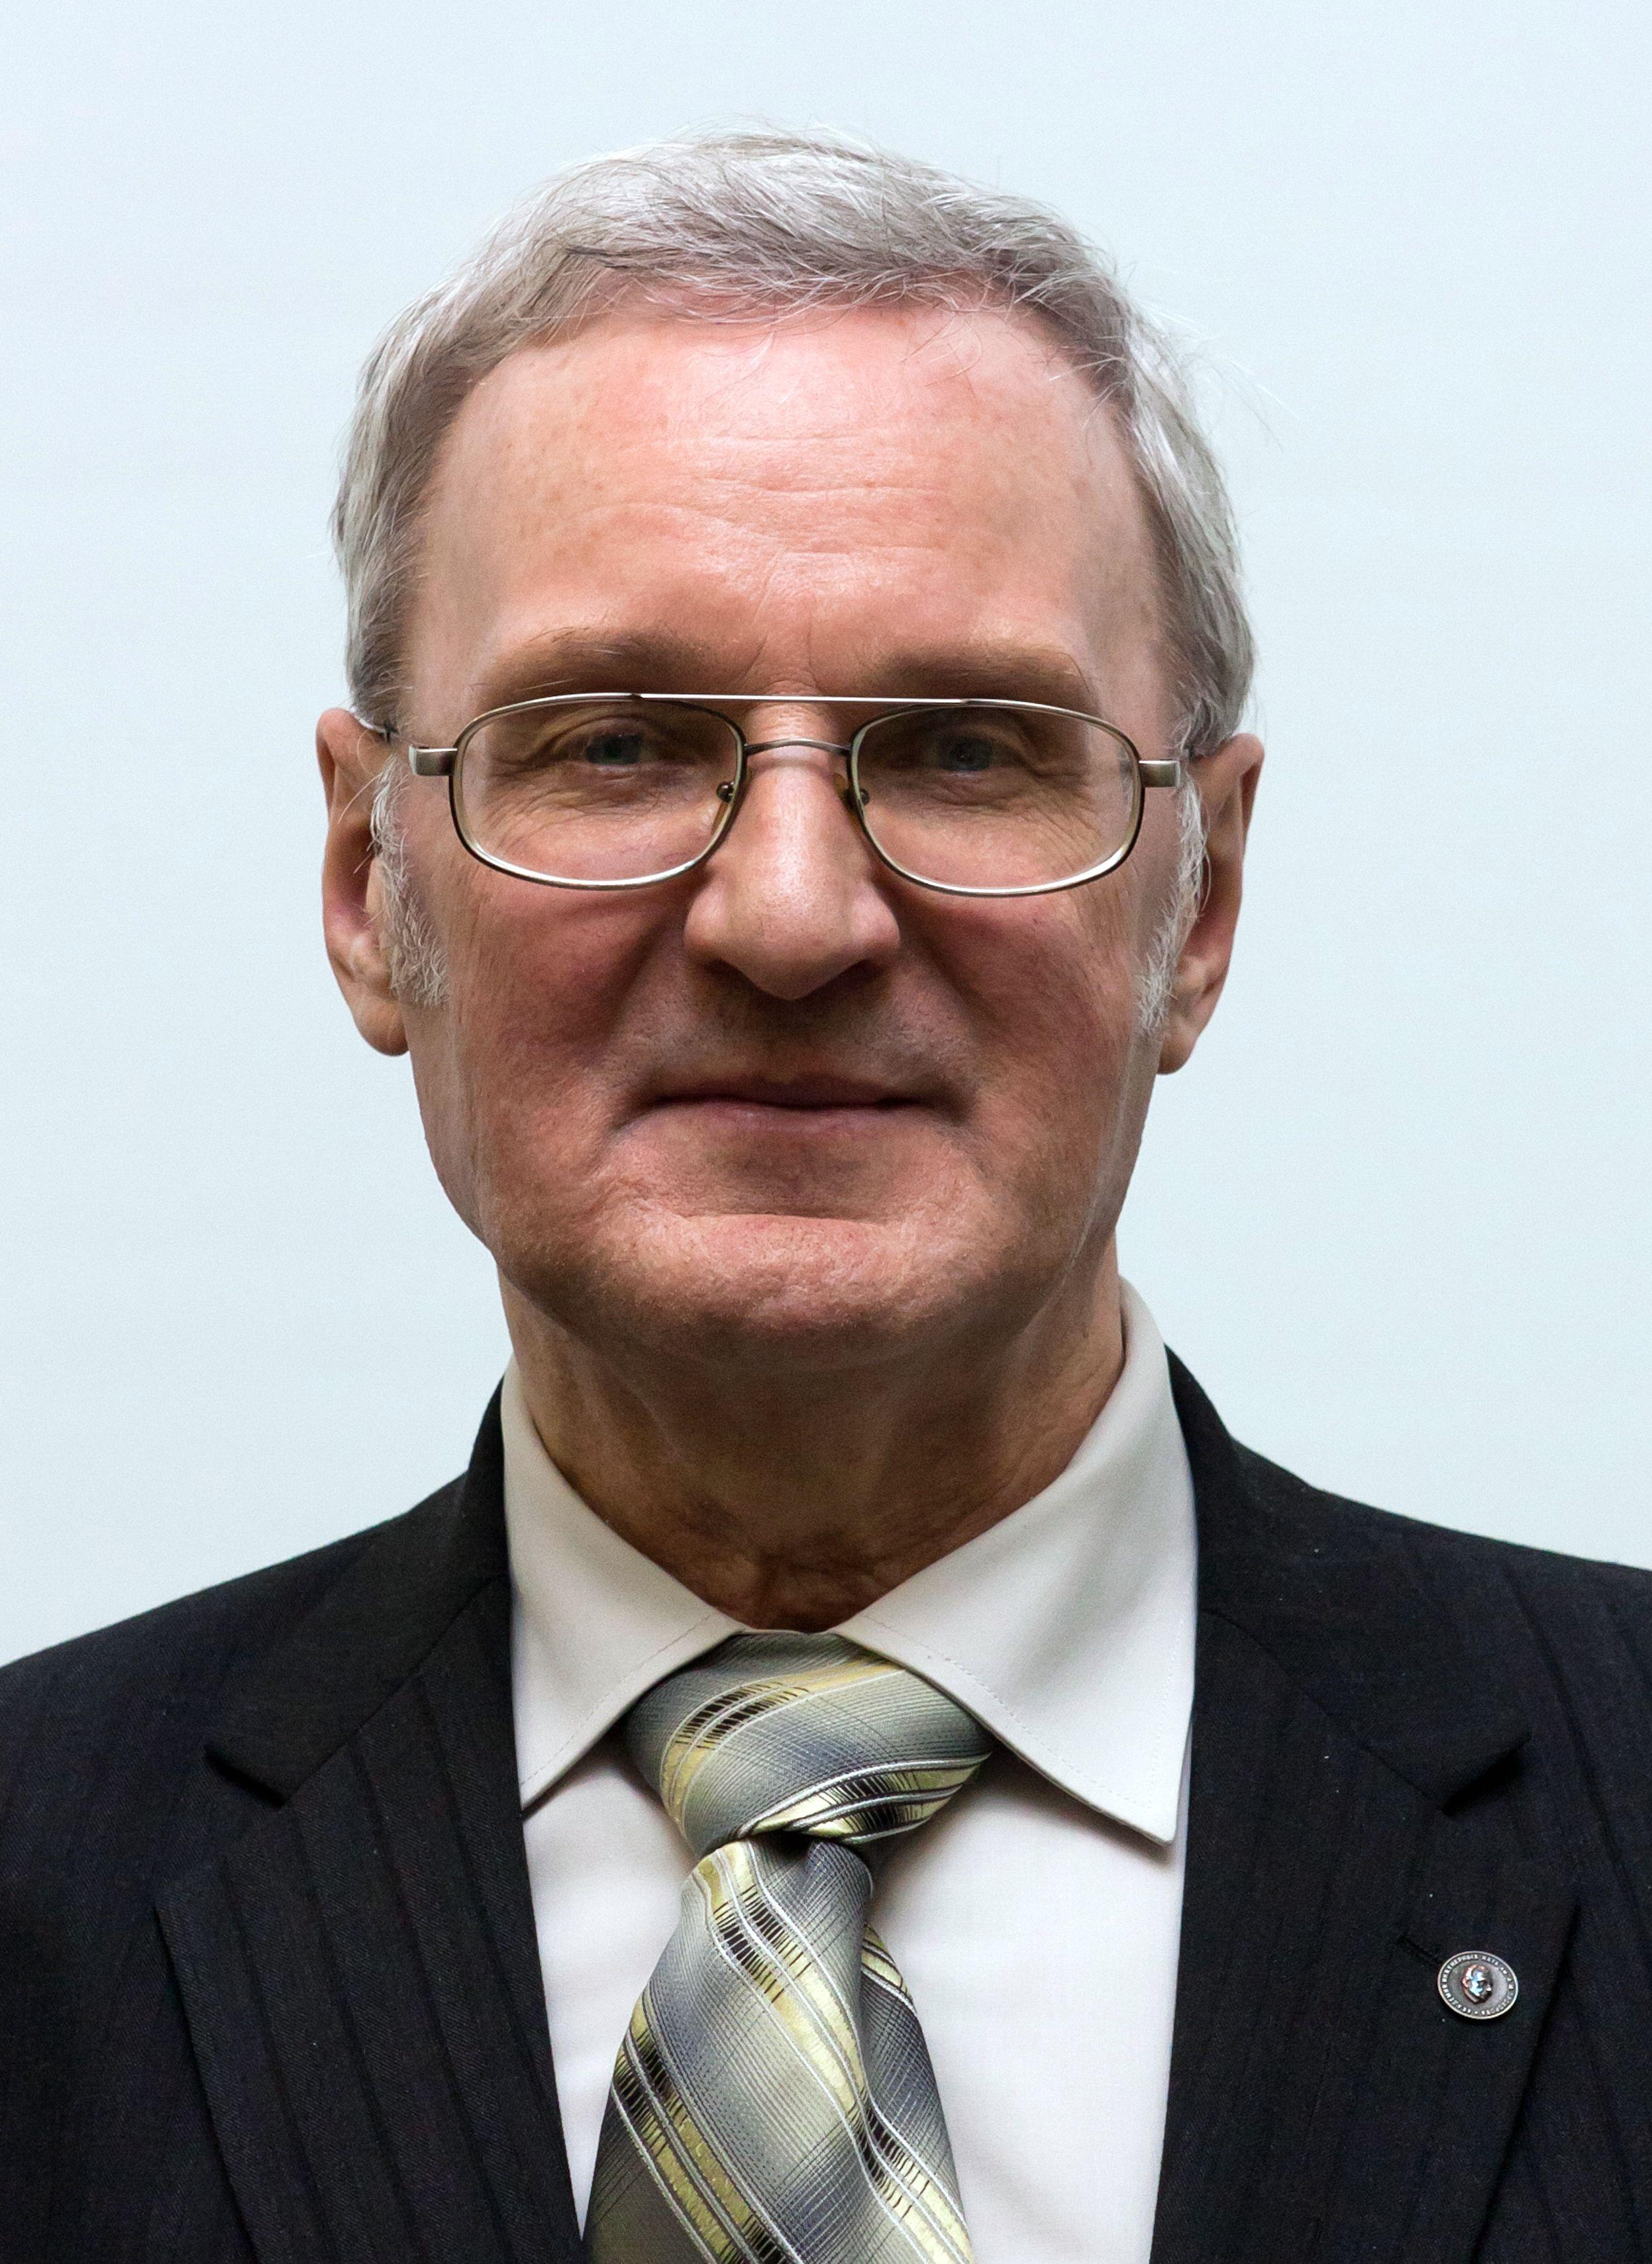 Иванов Вячеслав Элизбарович